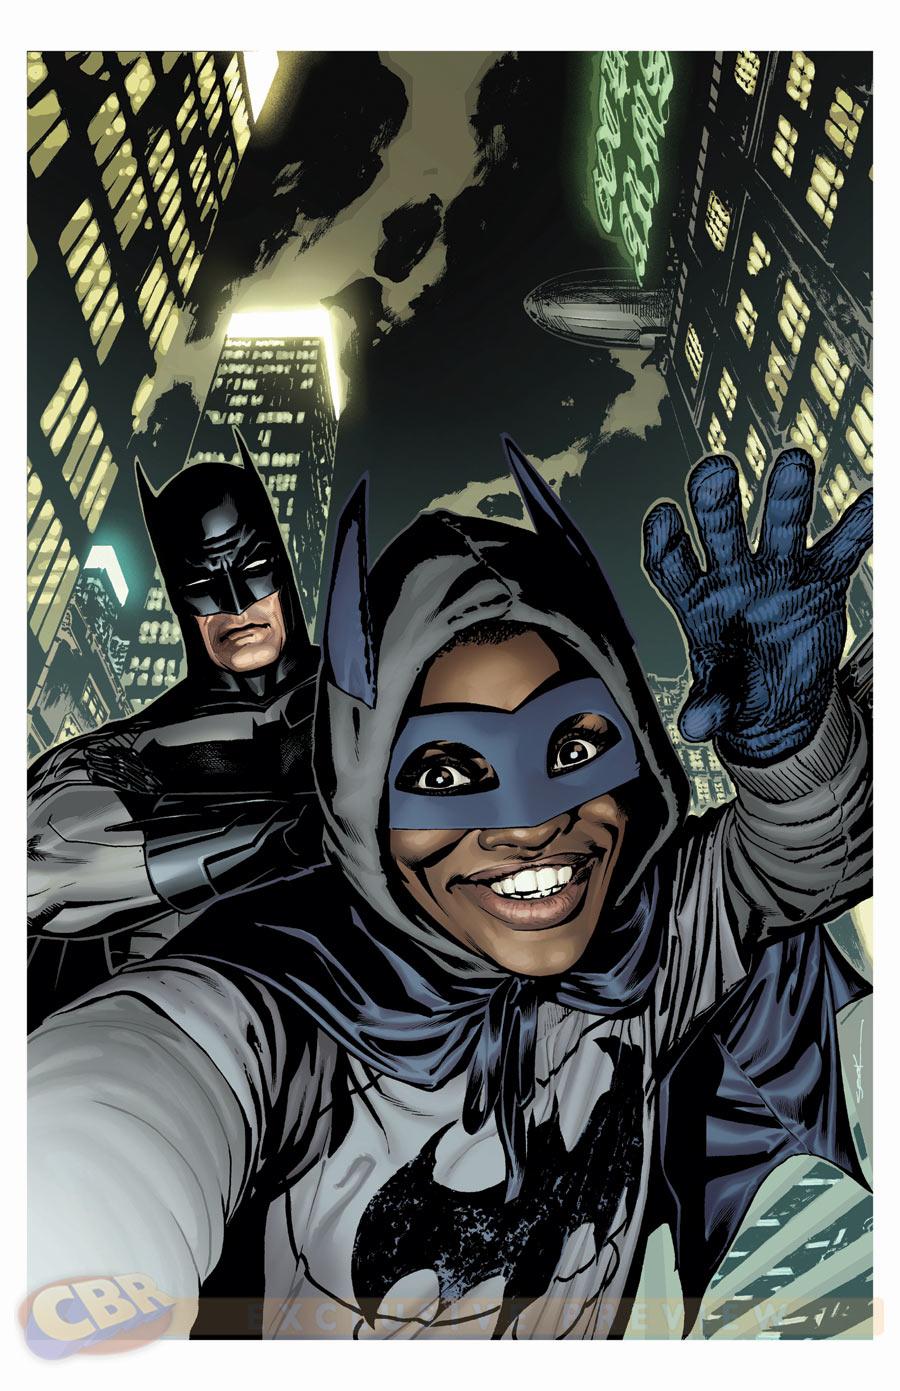 Les selfies des super héros